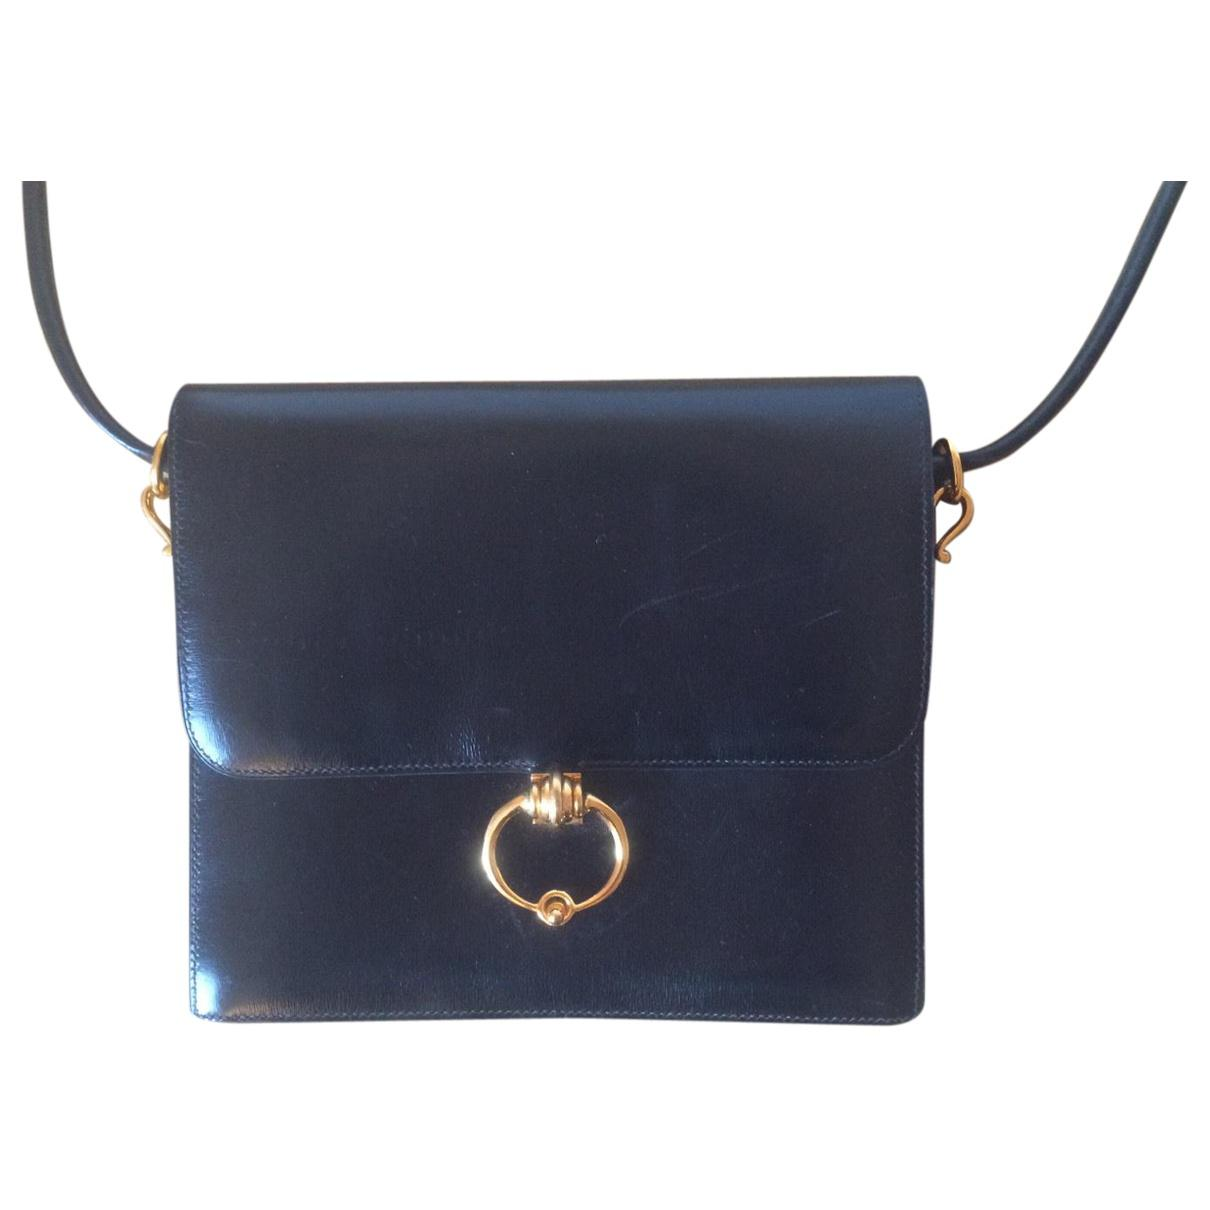 13c76d484e hot hermes epsom leather constance 18cm bag green 0edec 76bd6; italy lyst  hermès pre owned séquana bag in black f9139 a6aaf